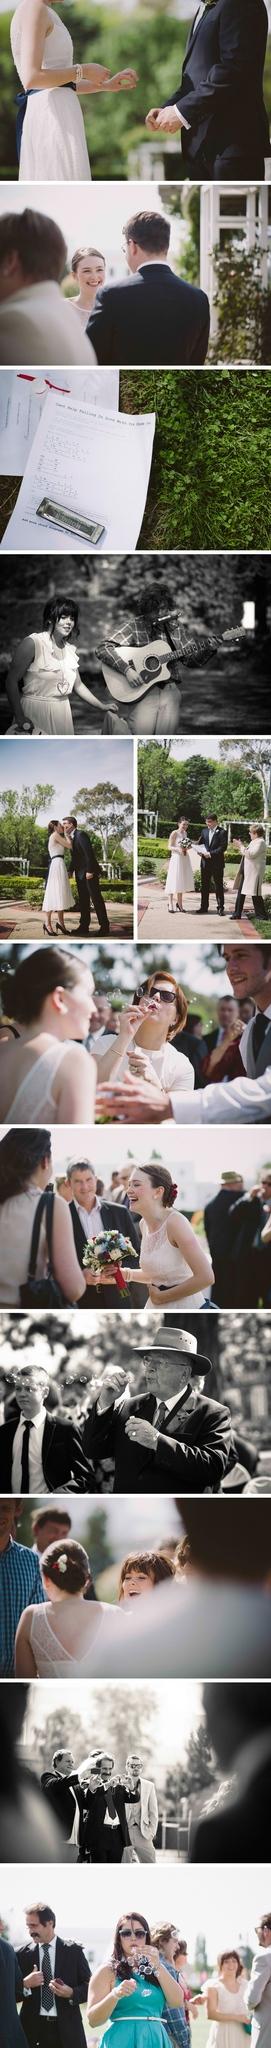 Canberra Wedding Photos